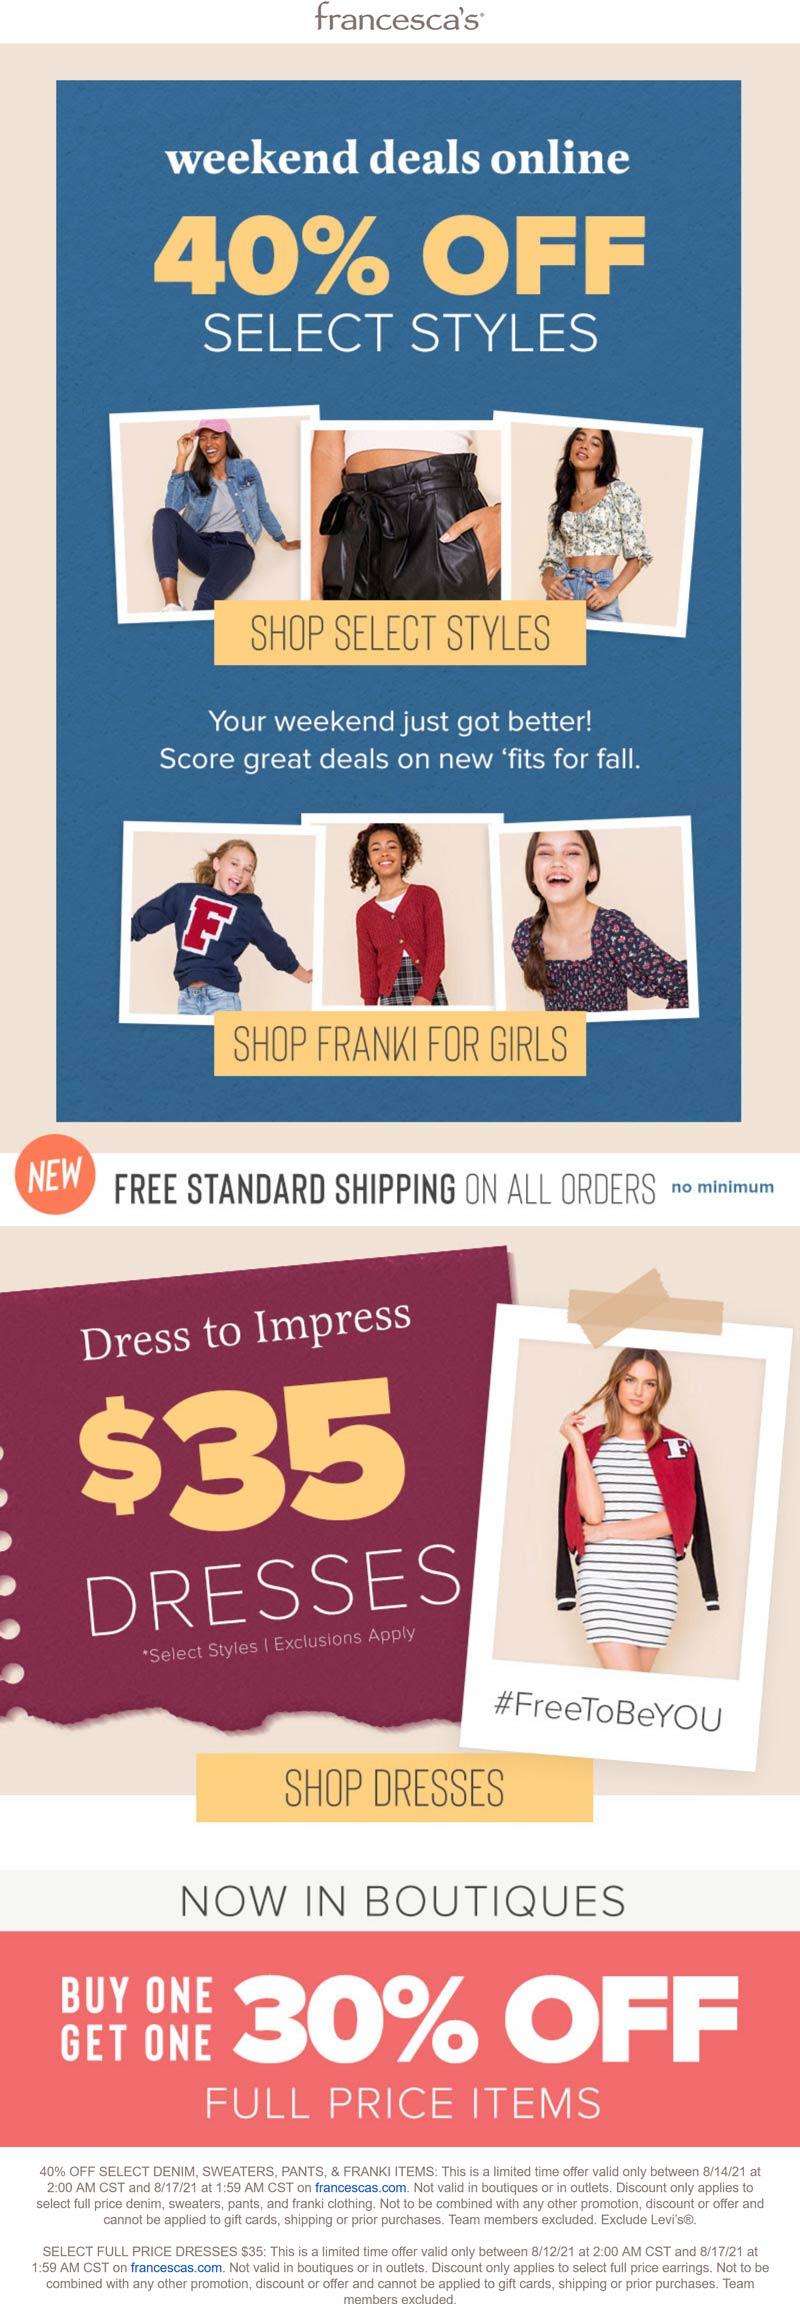 Francescas stores Coupon  Second item 30% off & more at Francescas, or 40% off various online #francescas